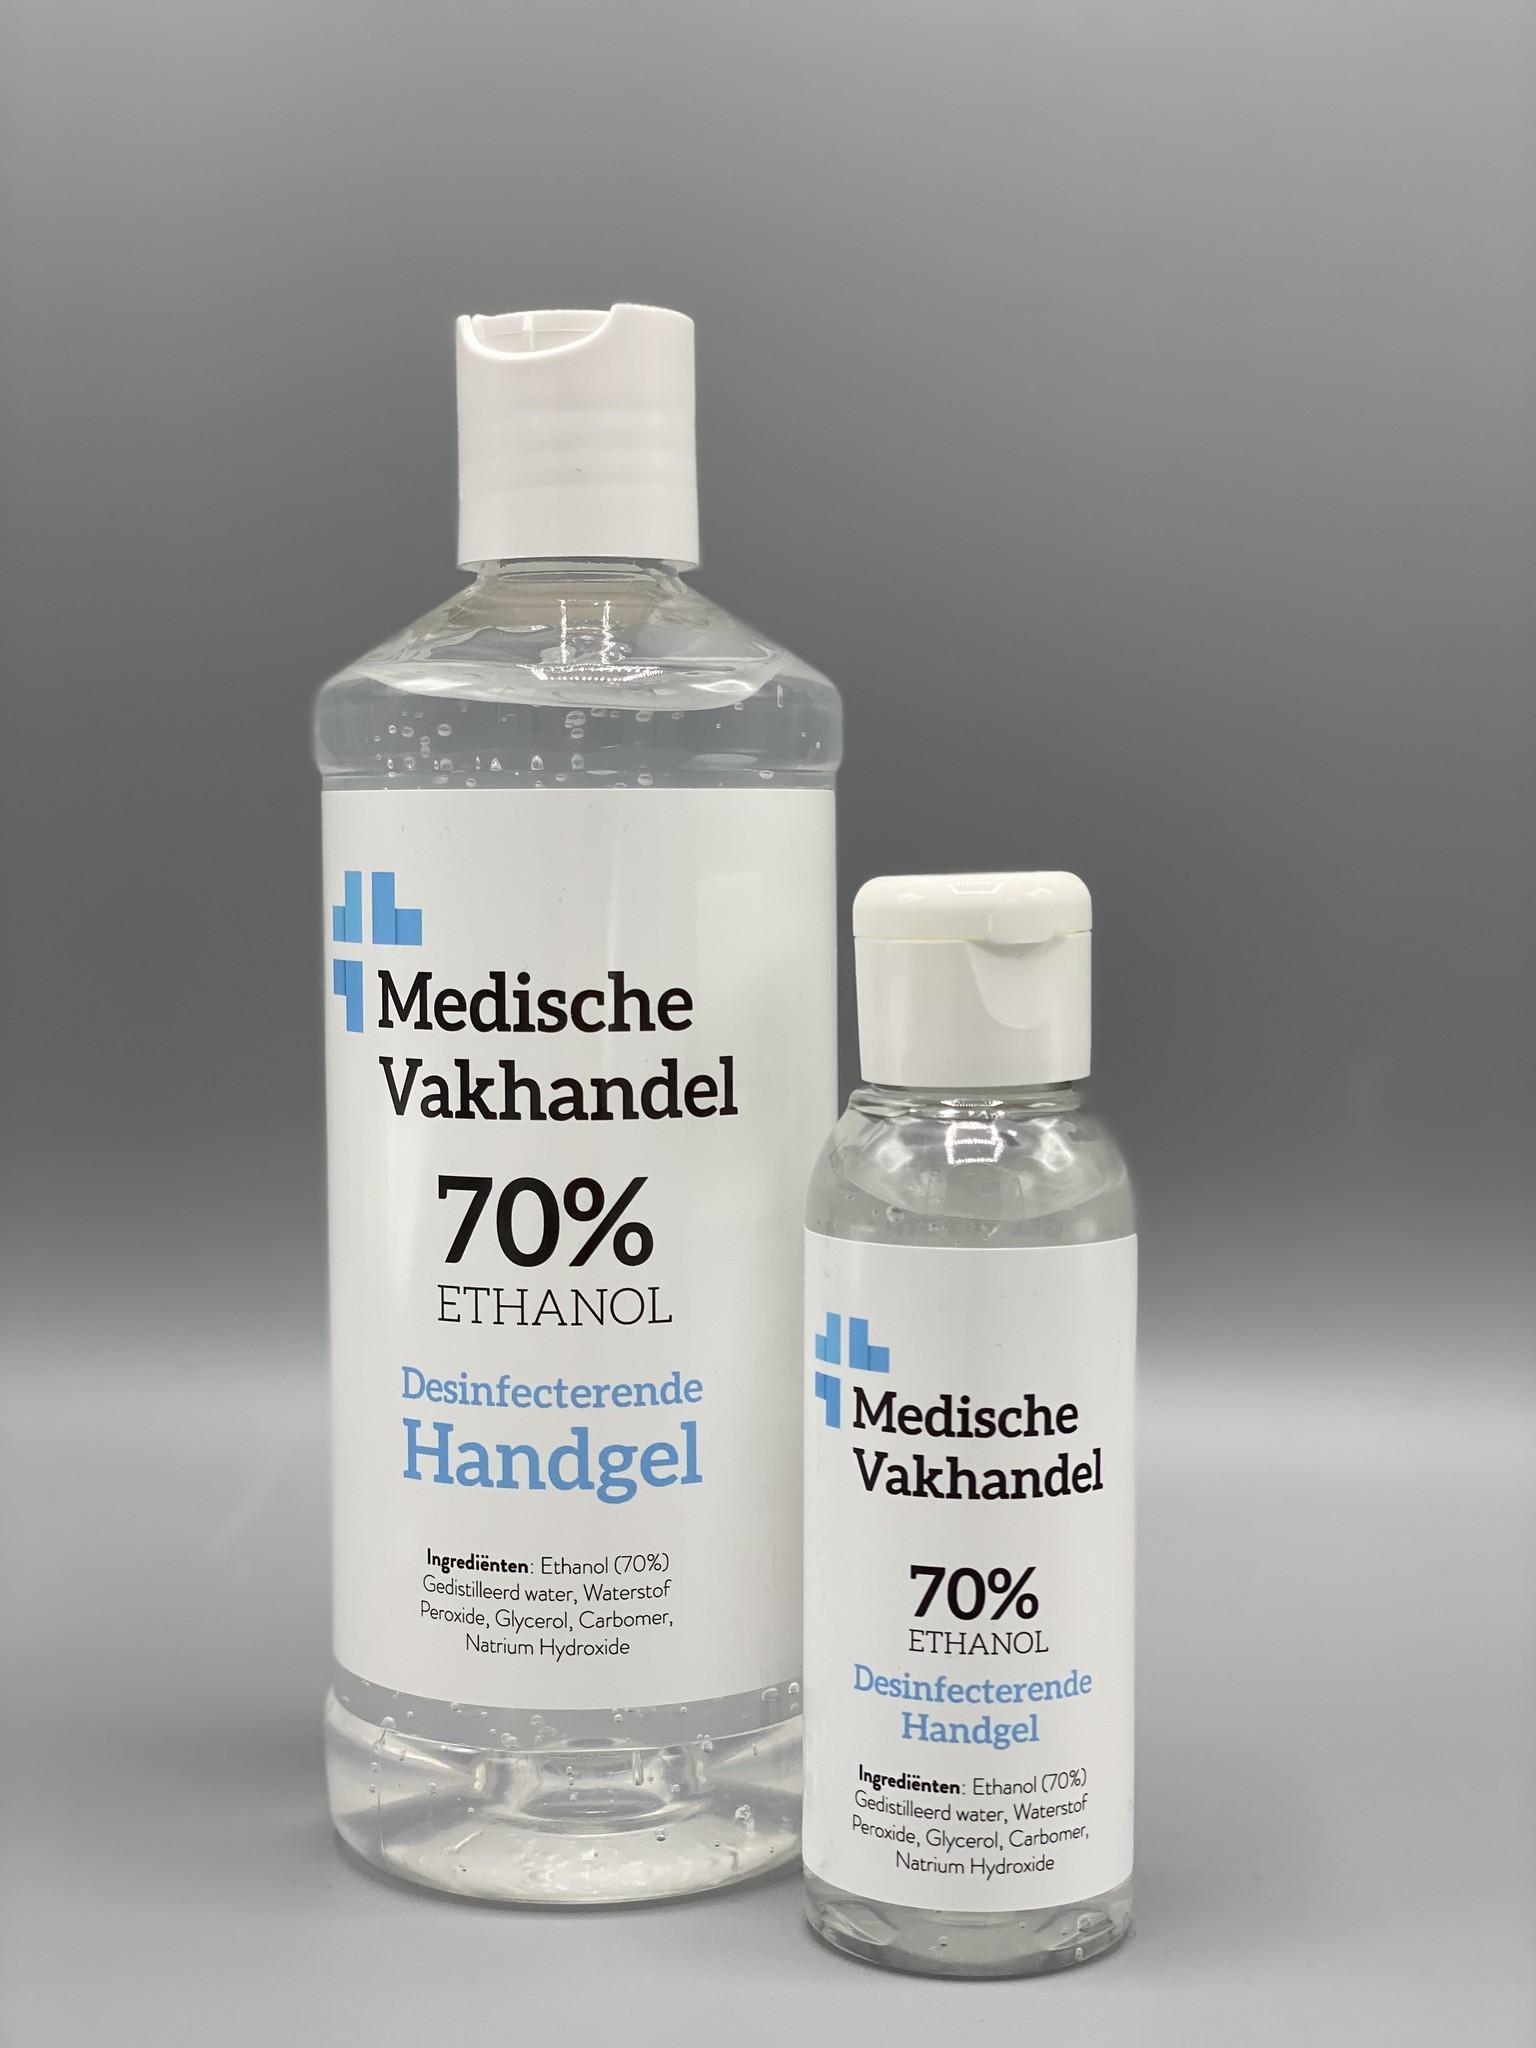 Medische Vakhandel Disinfectant hand gel 70% WHO prescription